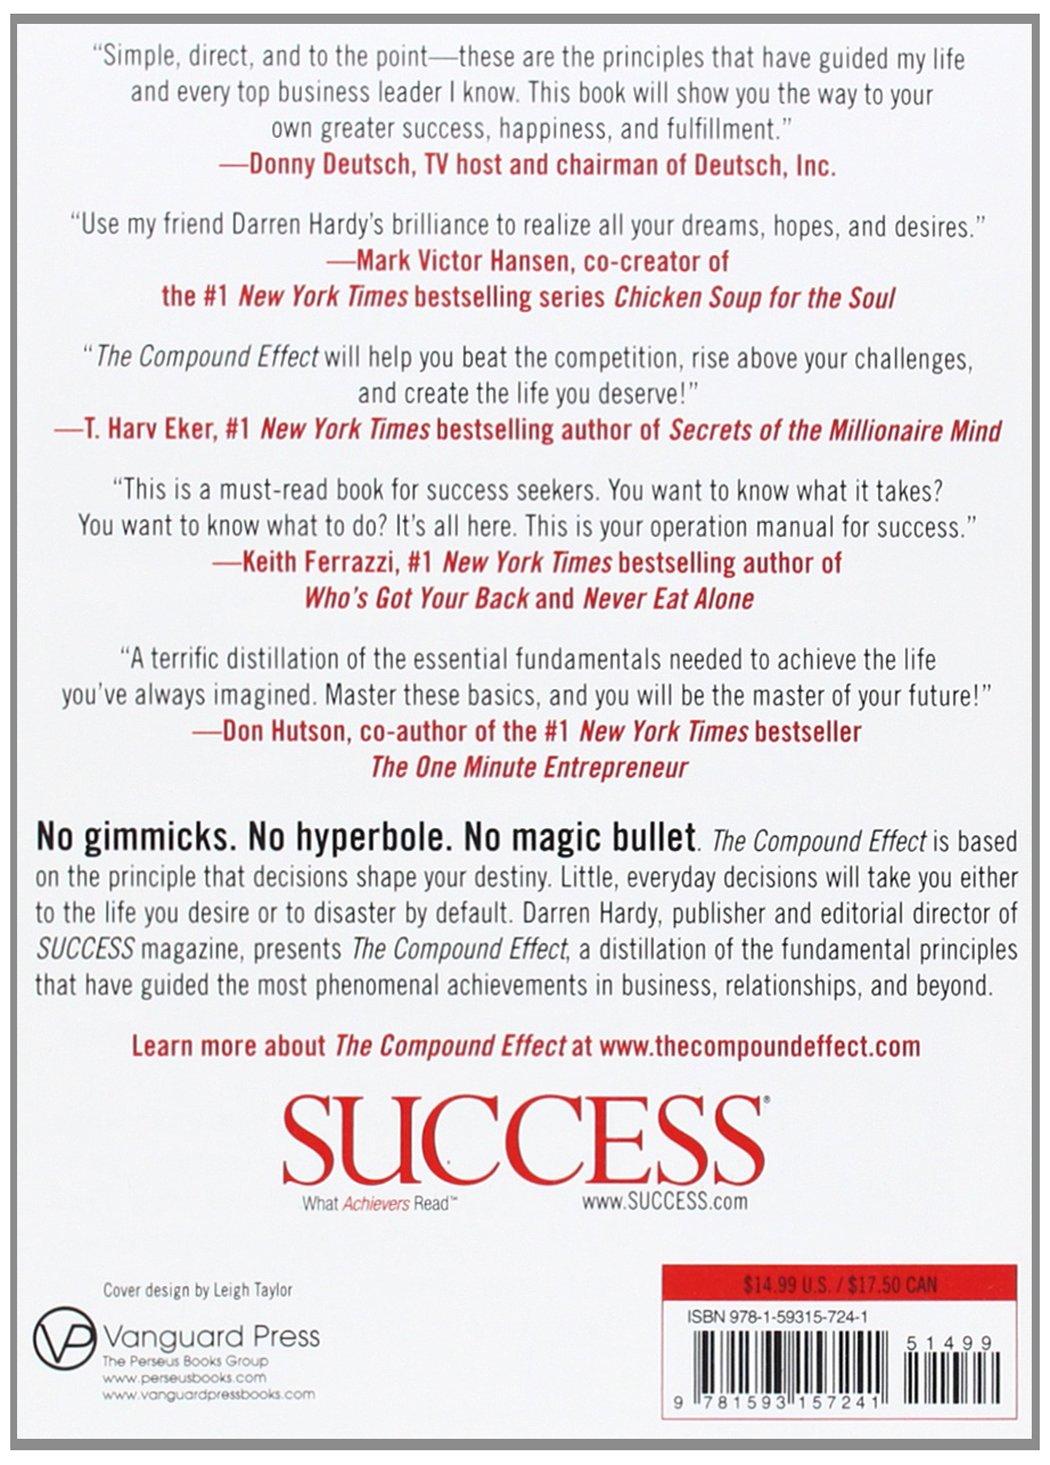 The Compound Effect: Darren Hardy: 9781593157241: Amazon.com: Books